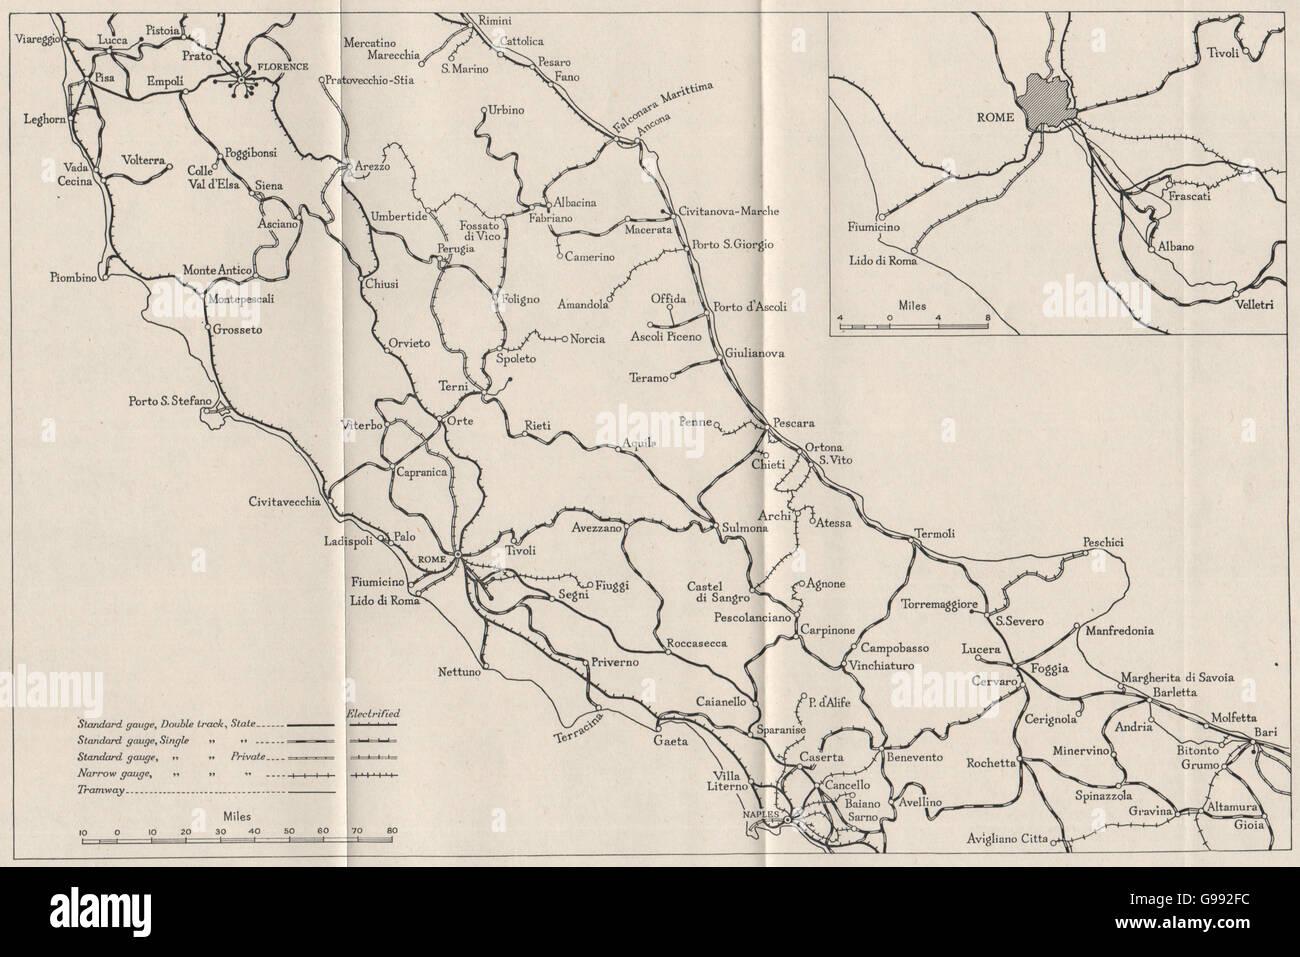 CENTRAL ITALY: Railways. WW2 ROYAL NAVY INTELLIGENCE MAP, 1945 - Stock Image